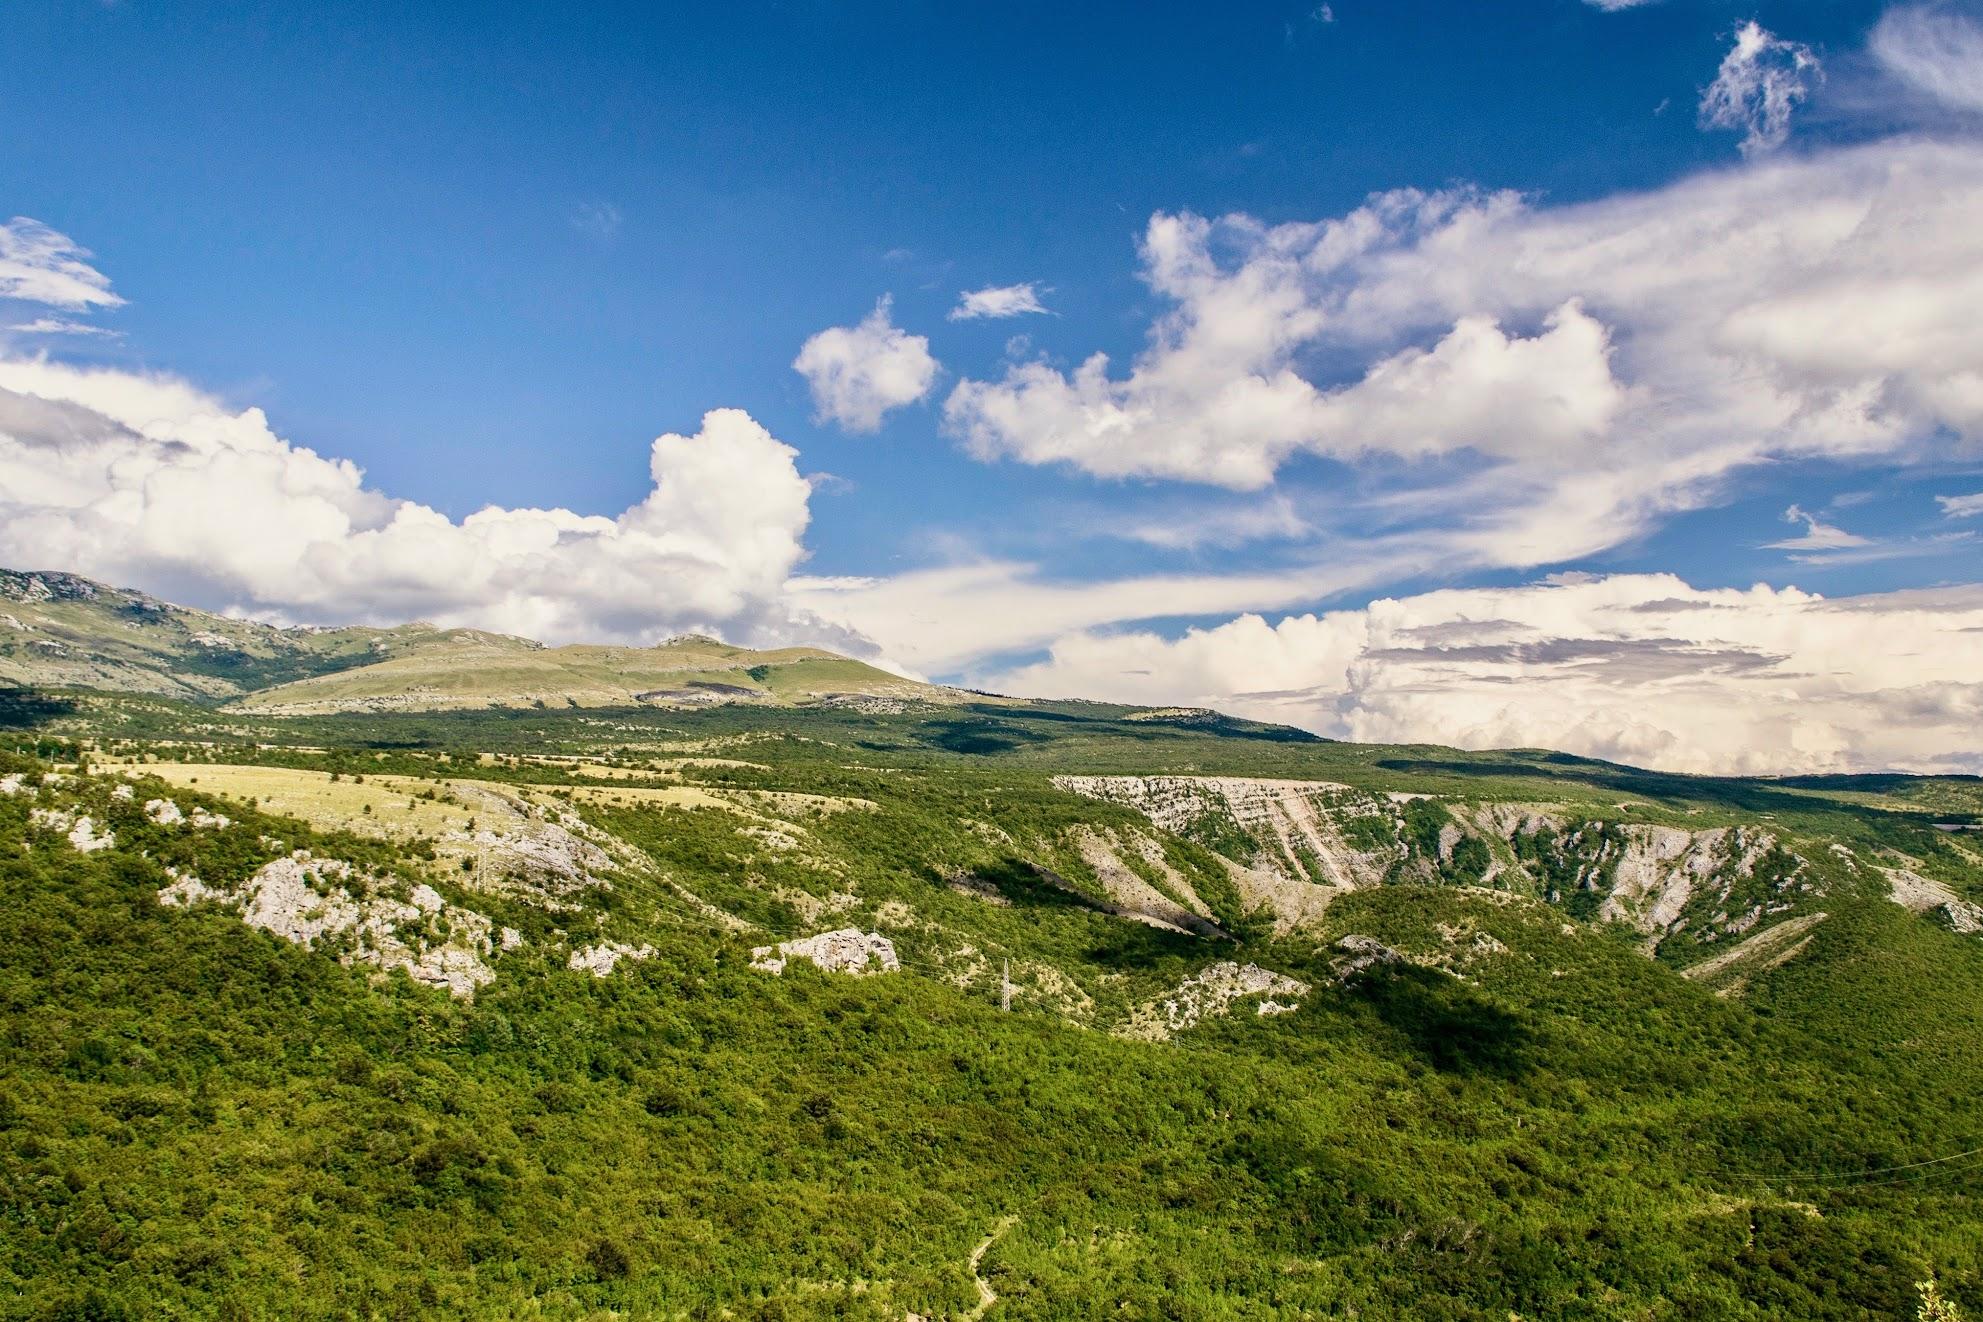 ervaring-auto-rijden-kroatie